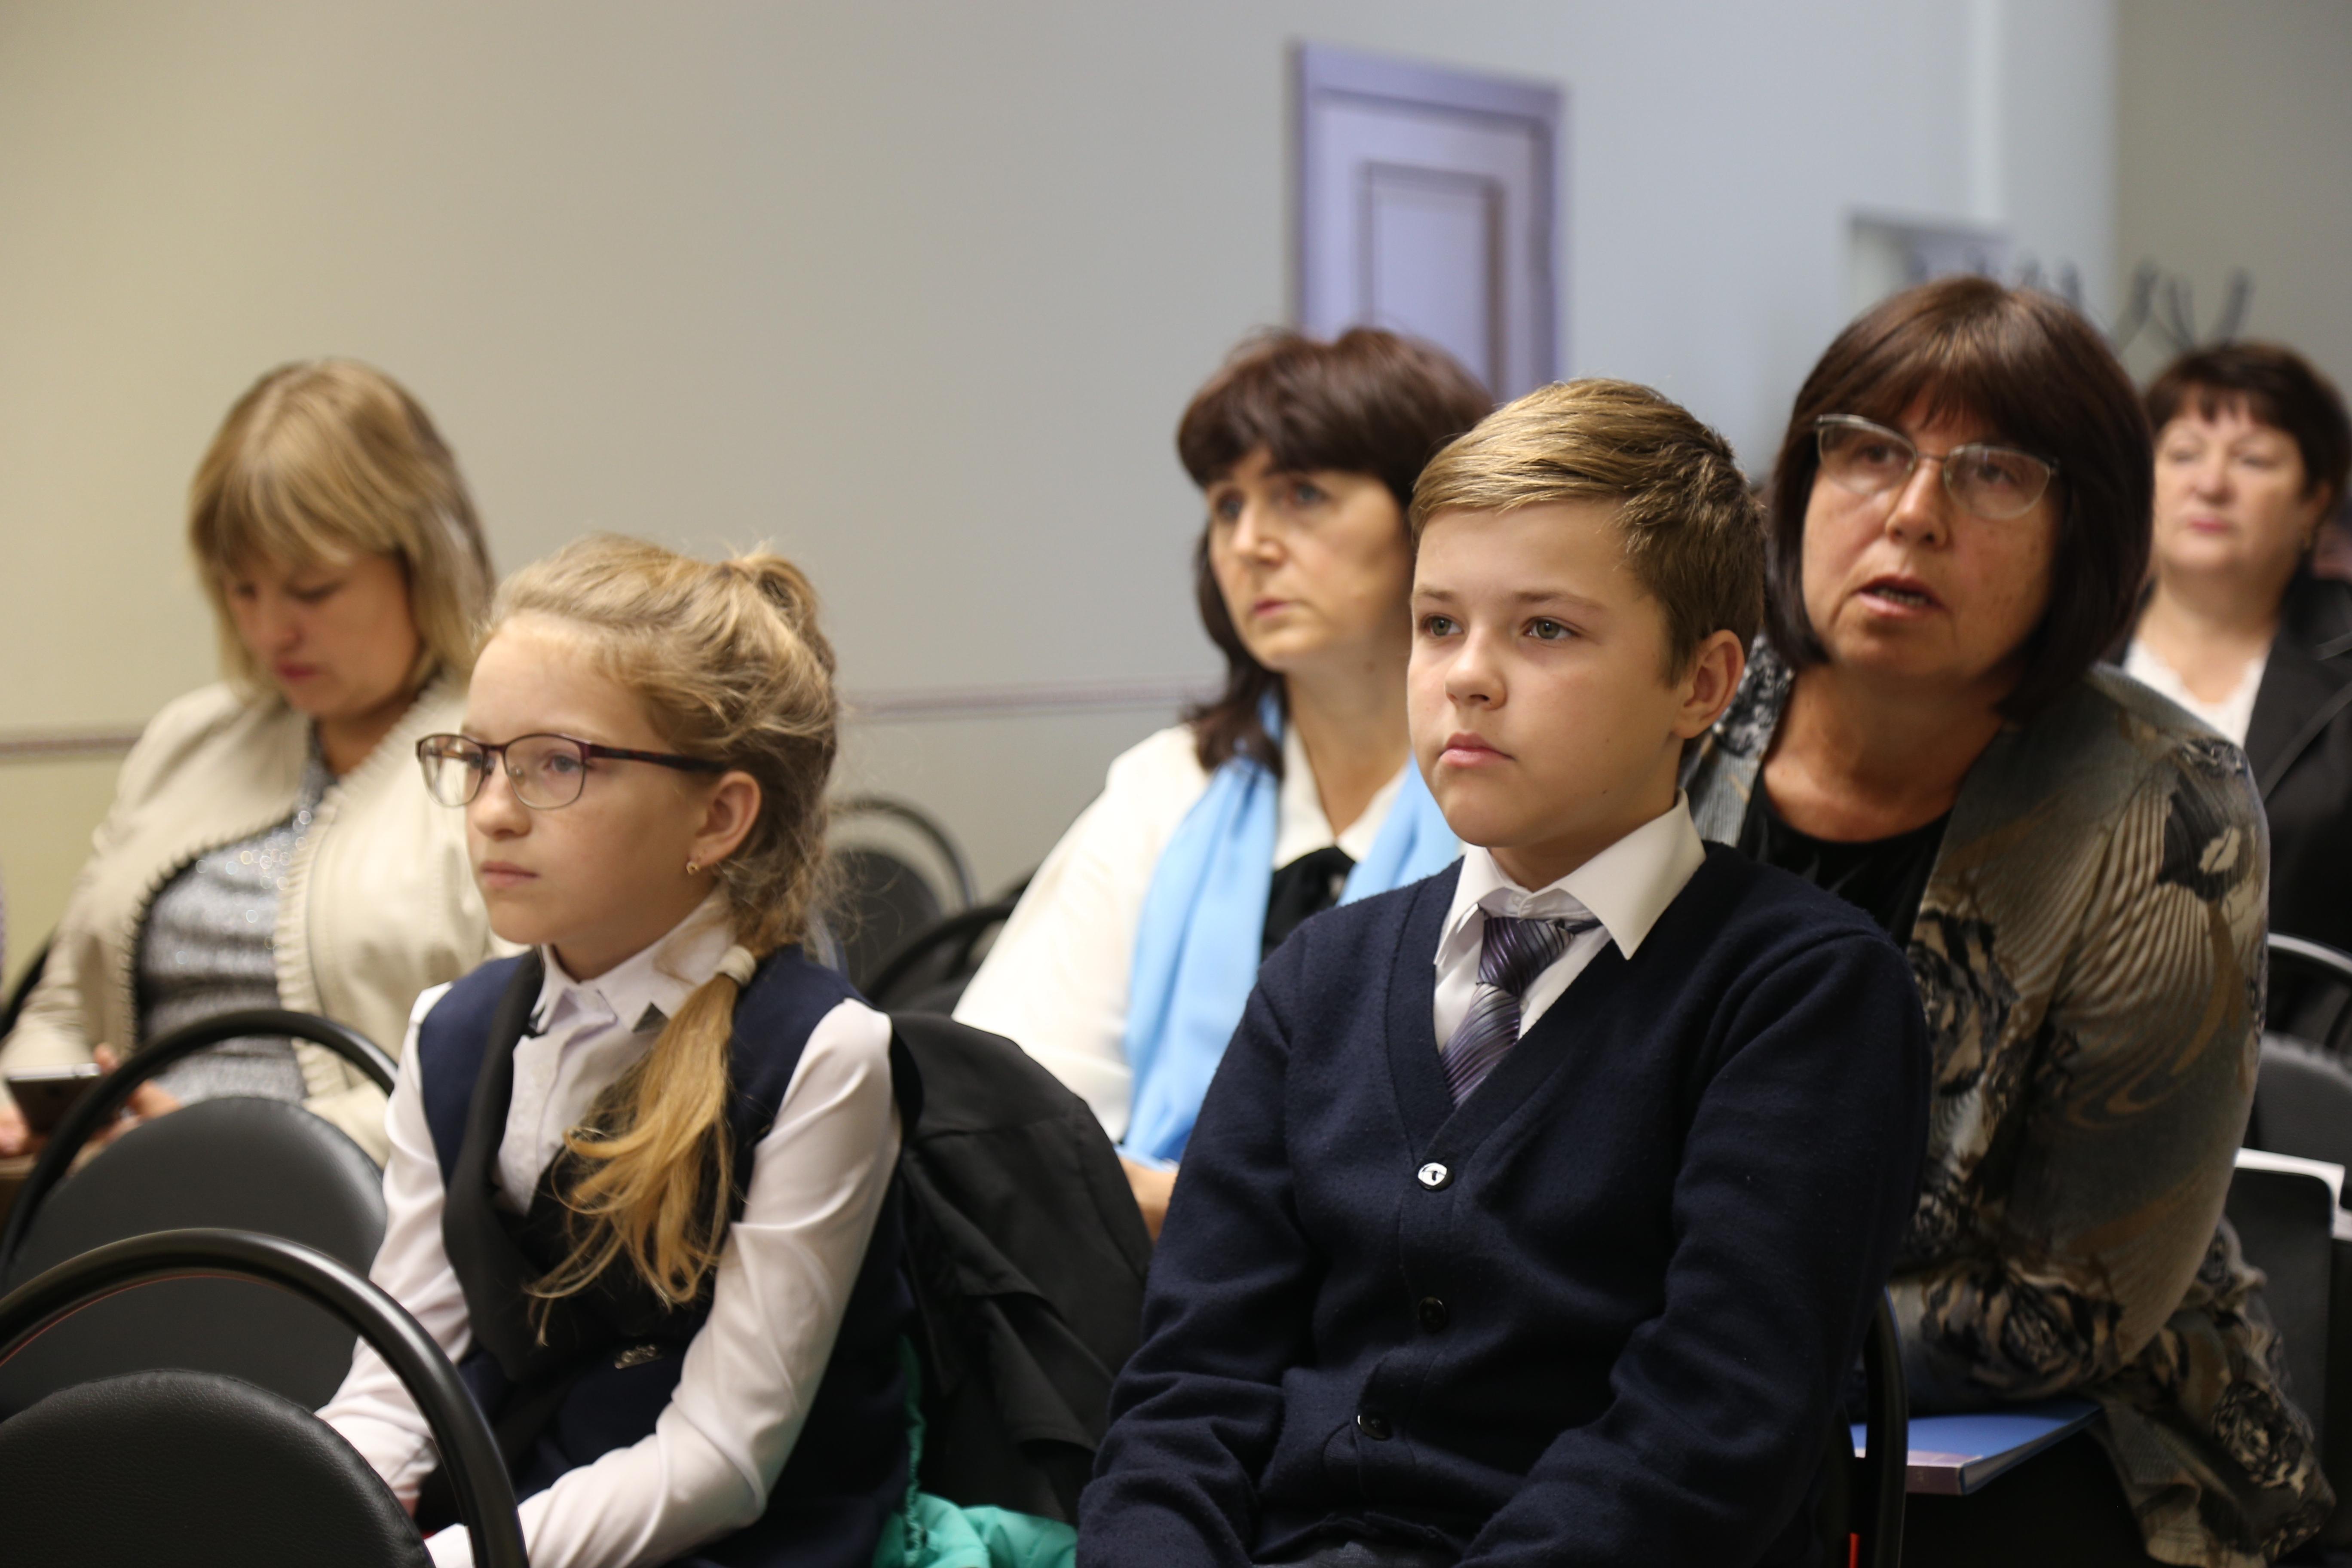 Картинки конференций школьников